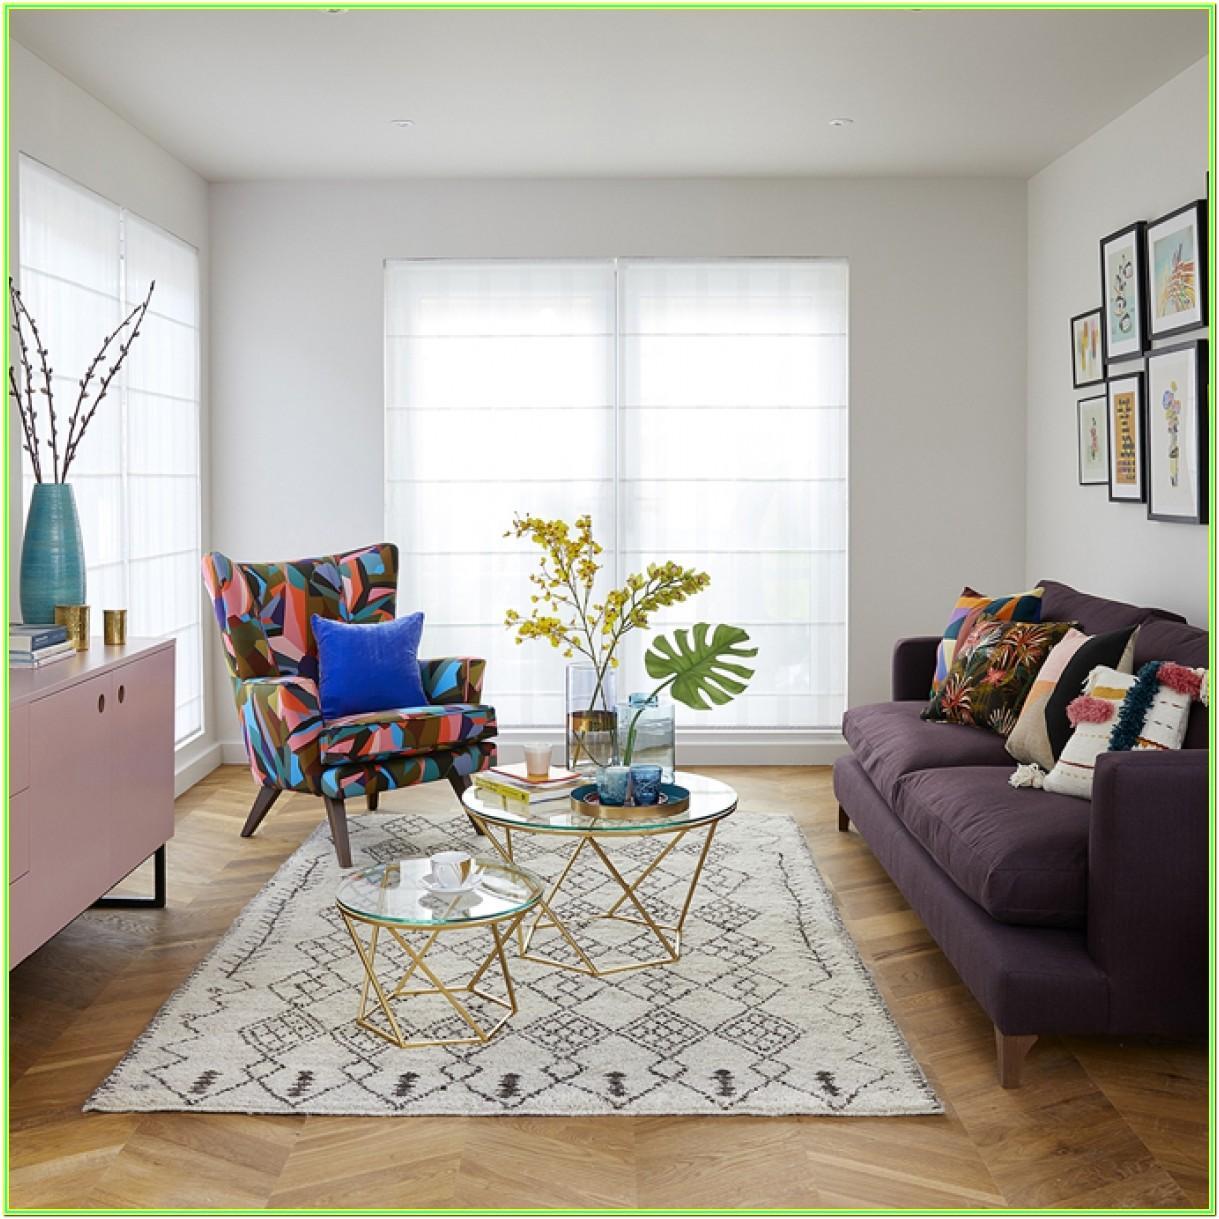 Living Room Open Plan Interior Design